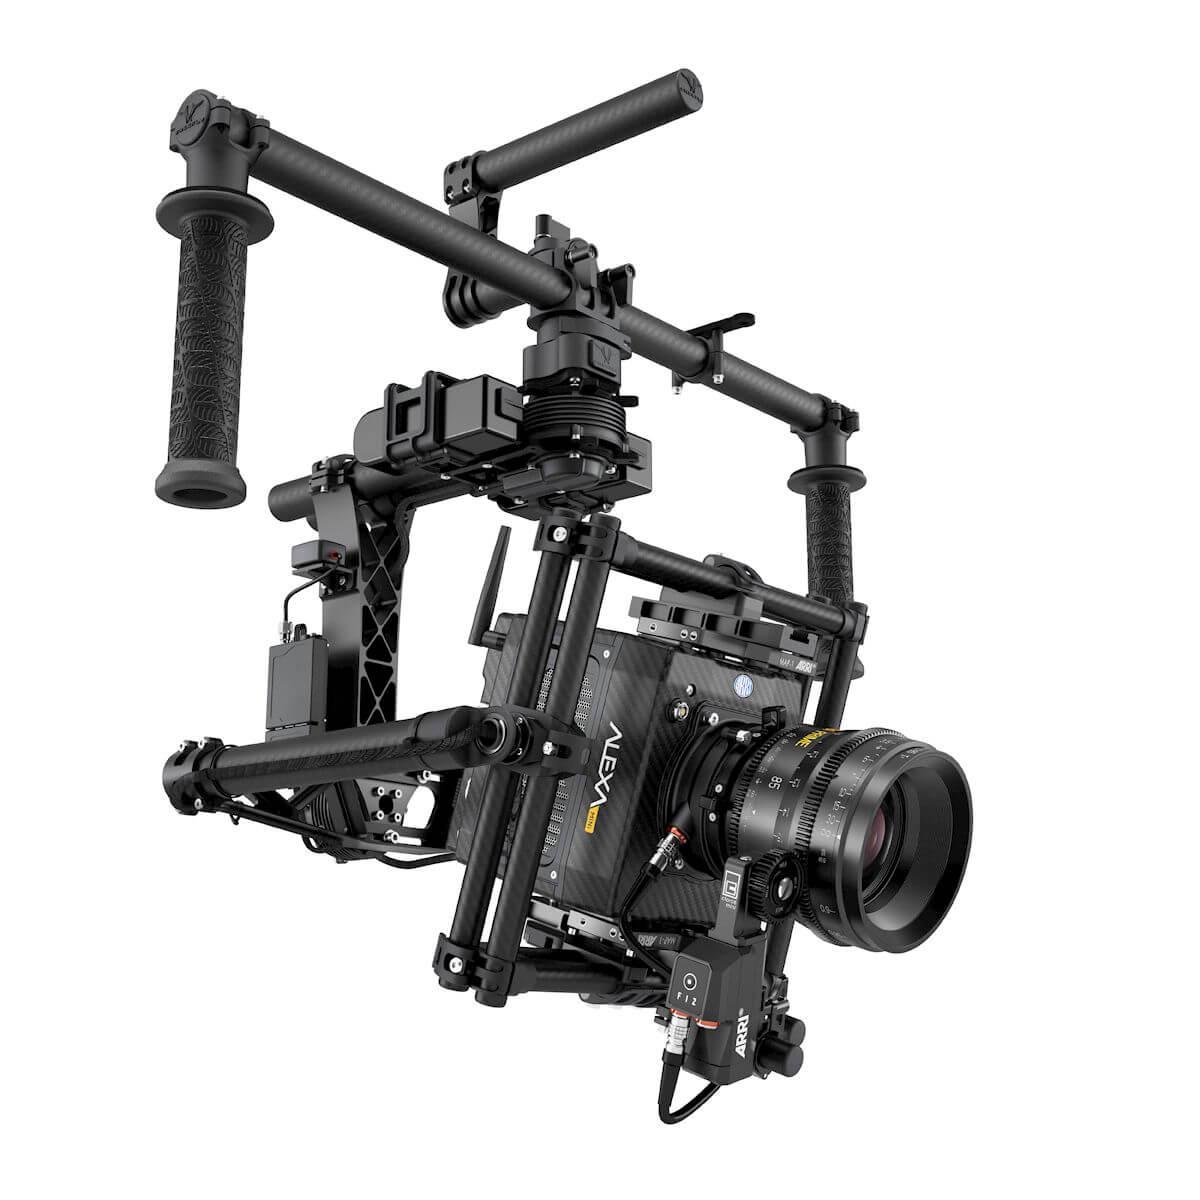 Camera Stabilizer hire | Madrid, Malaga, Sevilla, Bilbao, Barcelona, Mallorca | Camaleón Rental